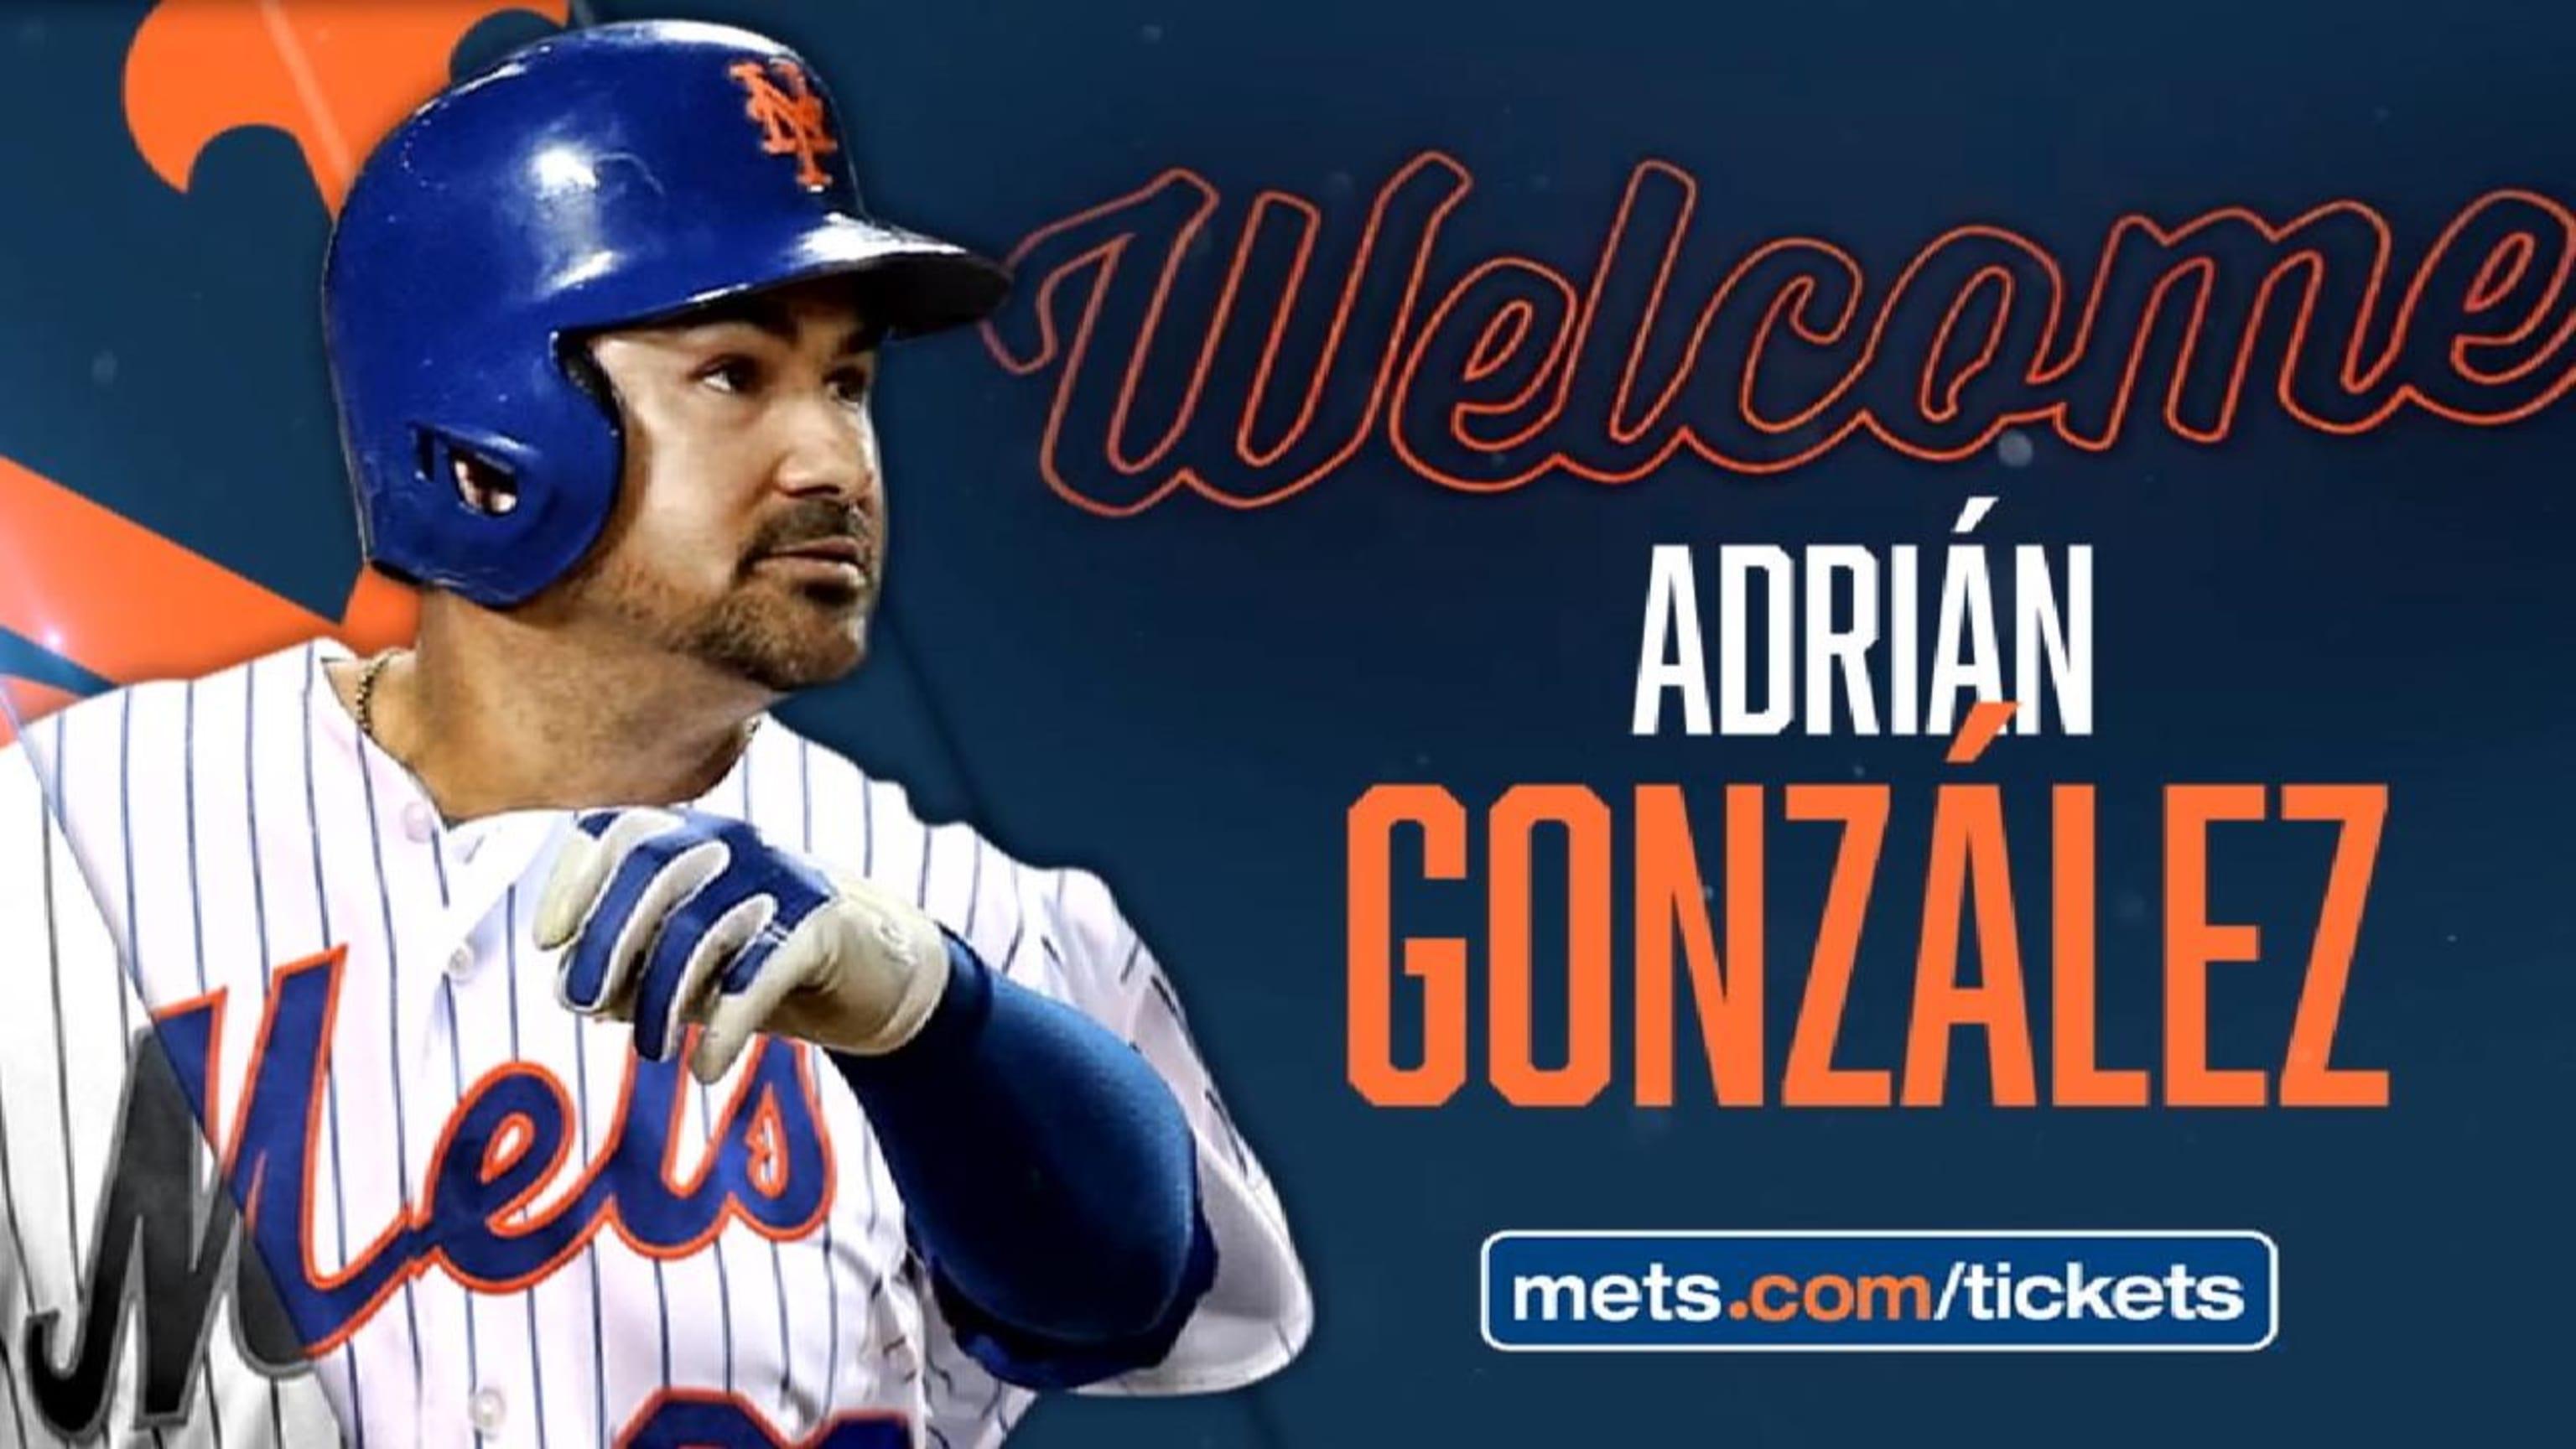 Adrian Gonzalez New York Mets Baseball Player Jersey